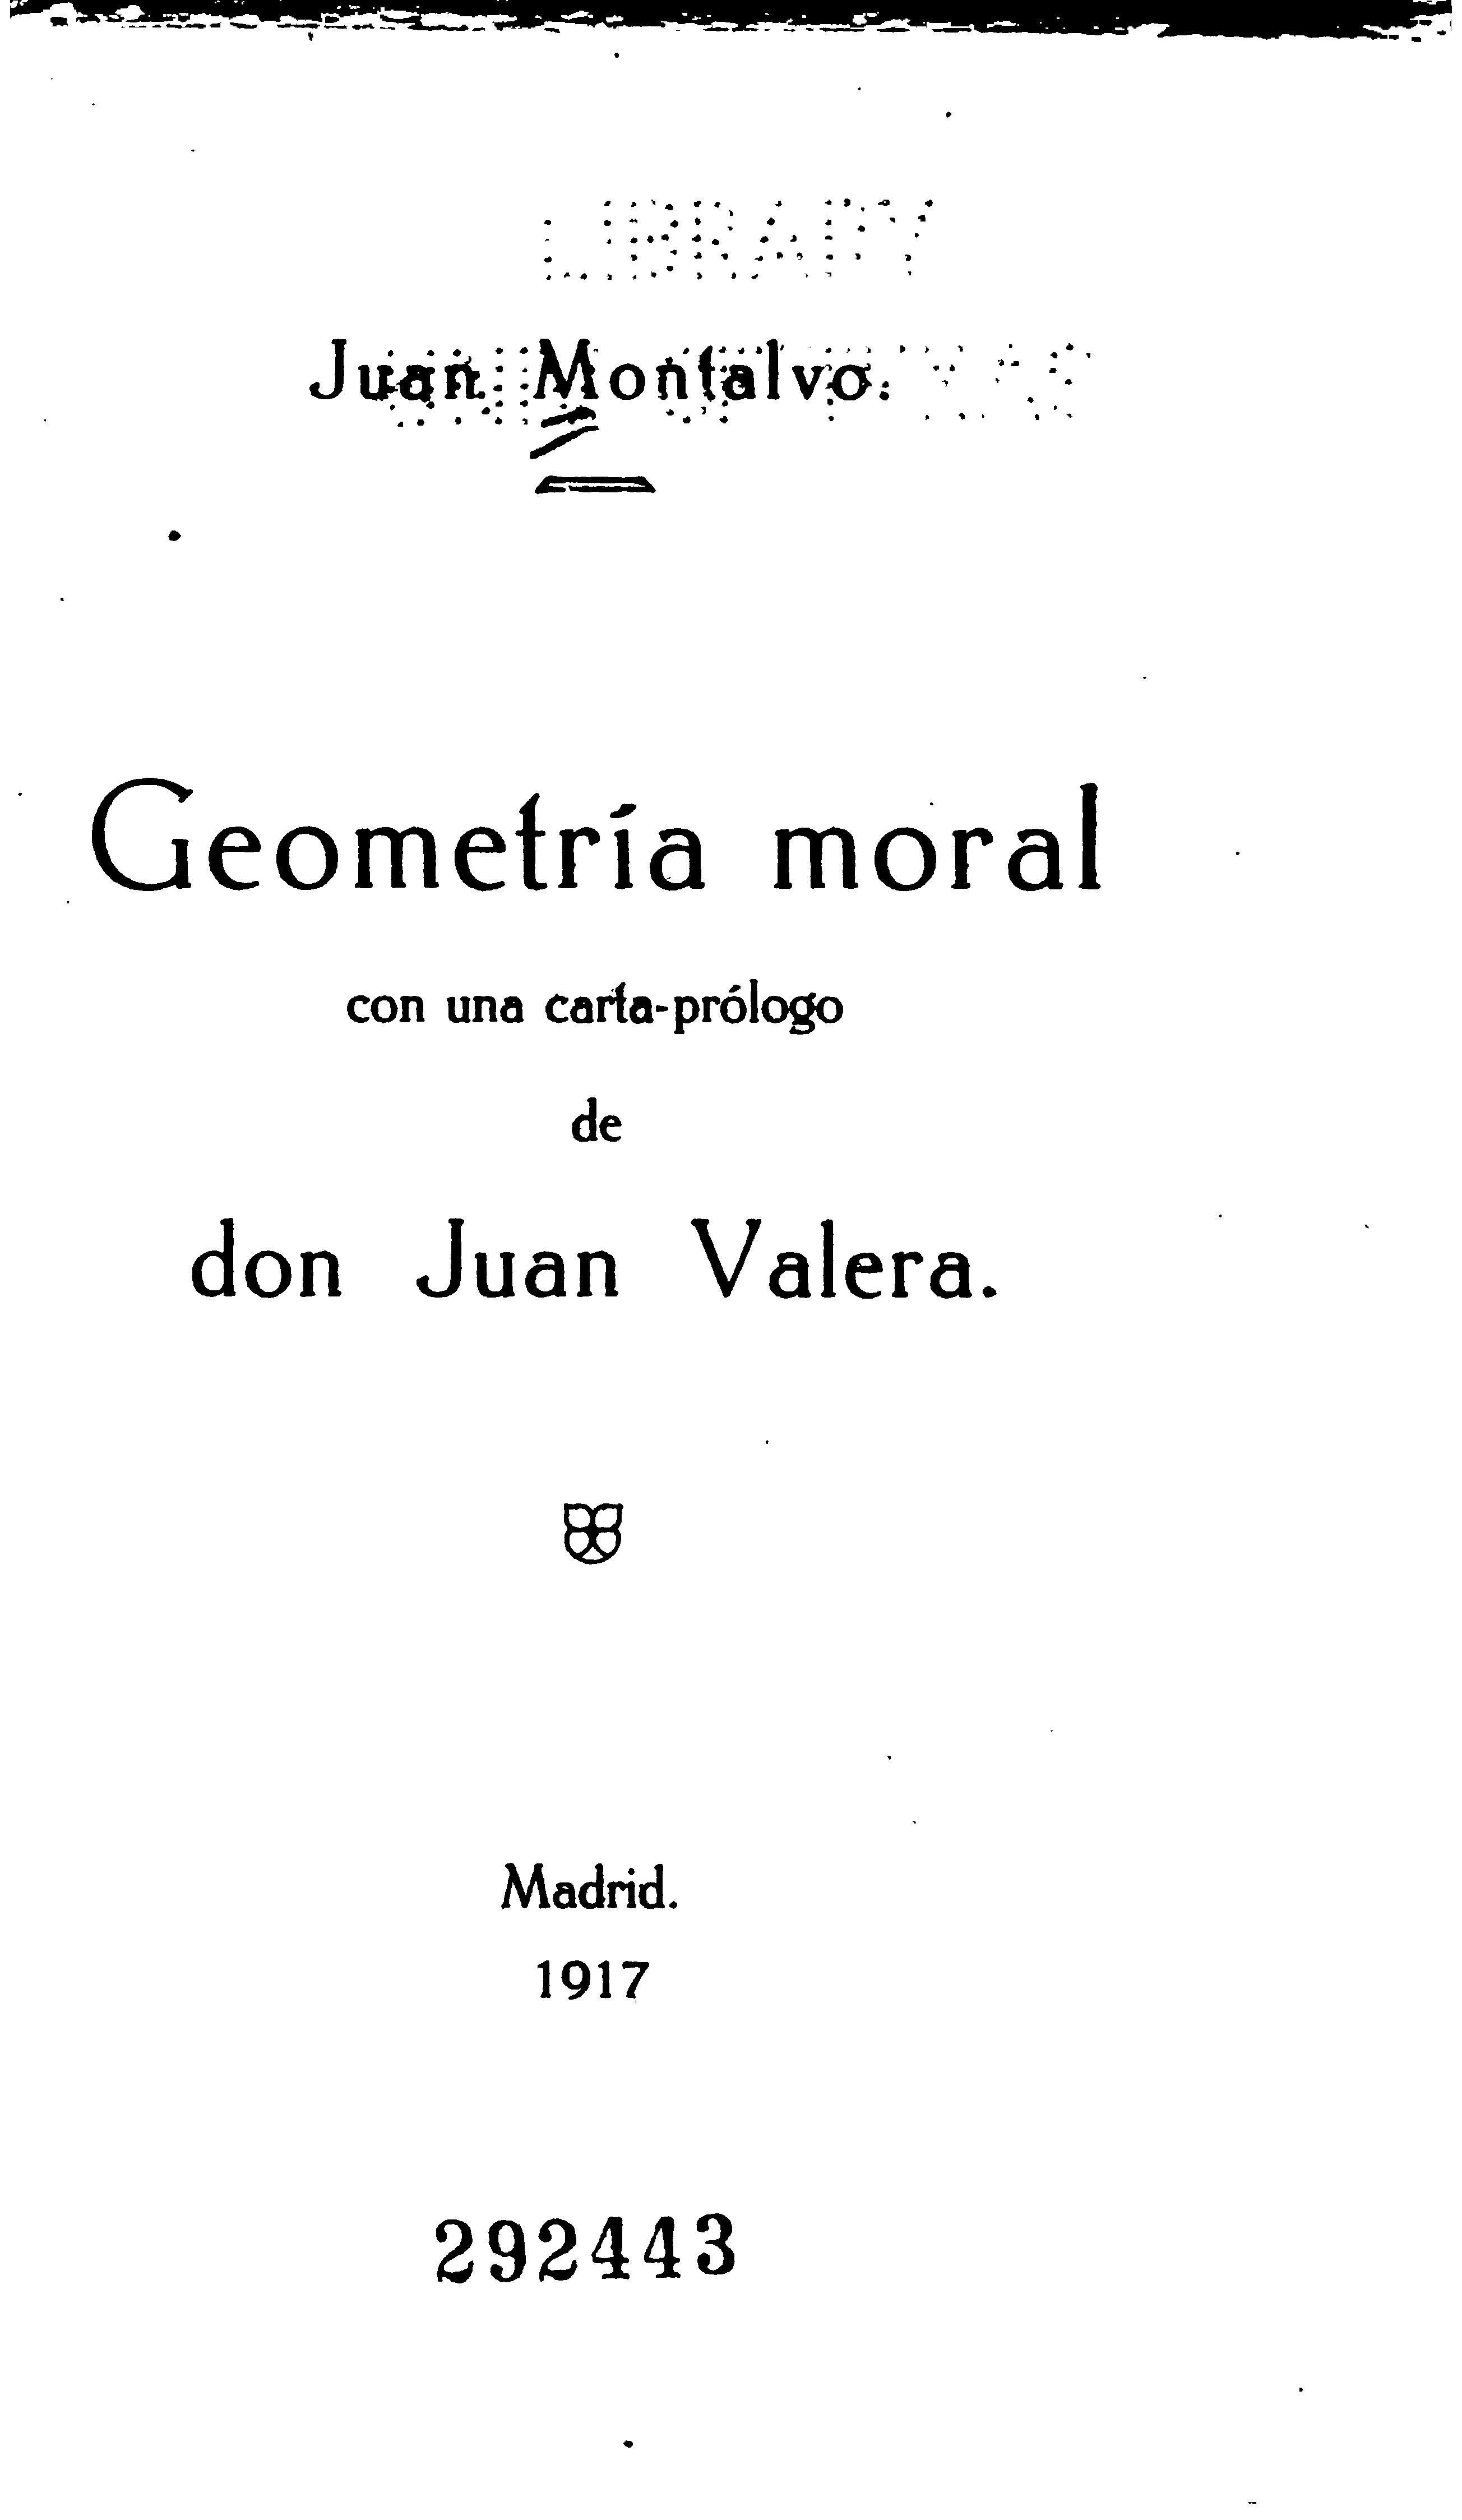 Archivo:Geometria moral.djvu - Wikisource